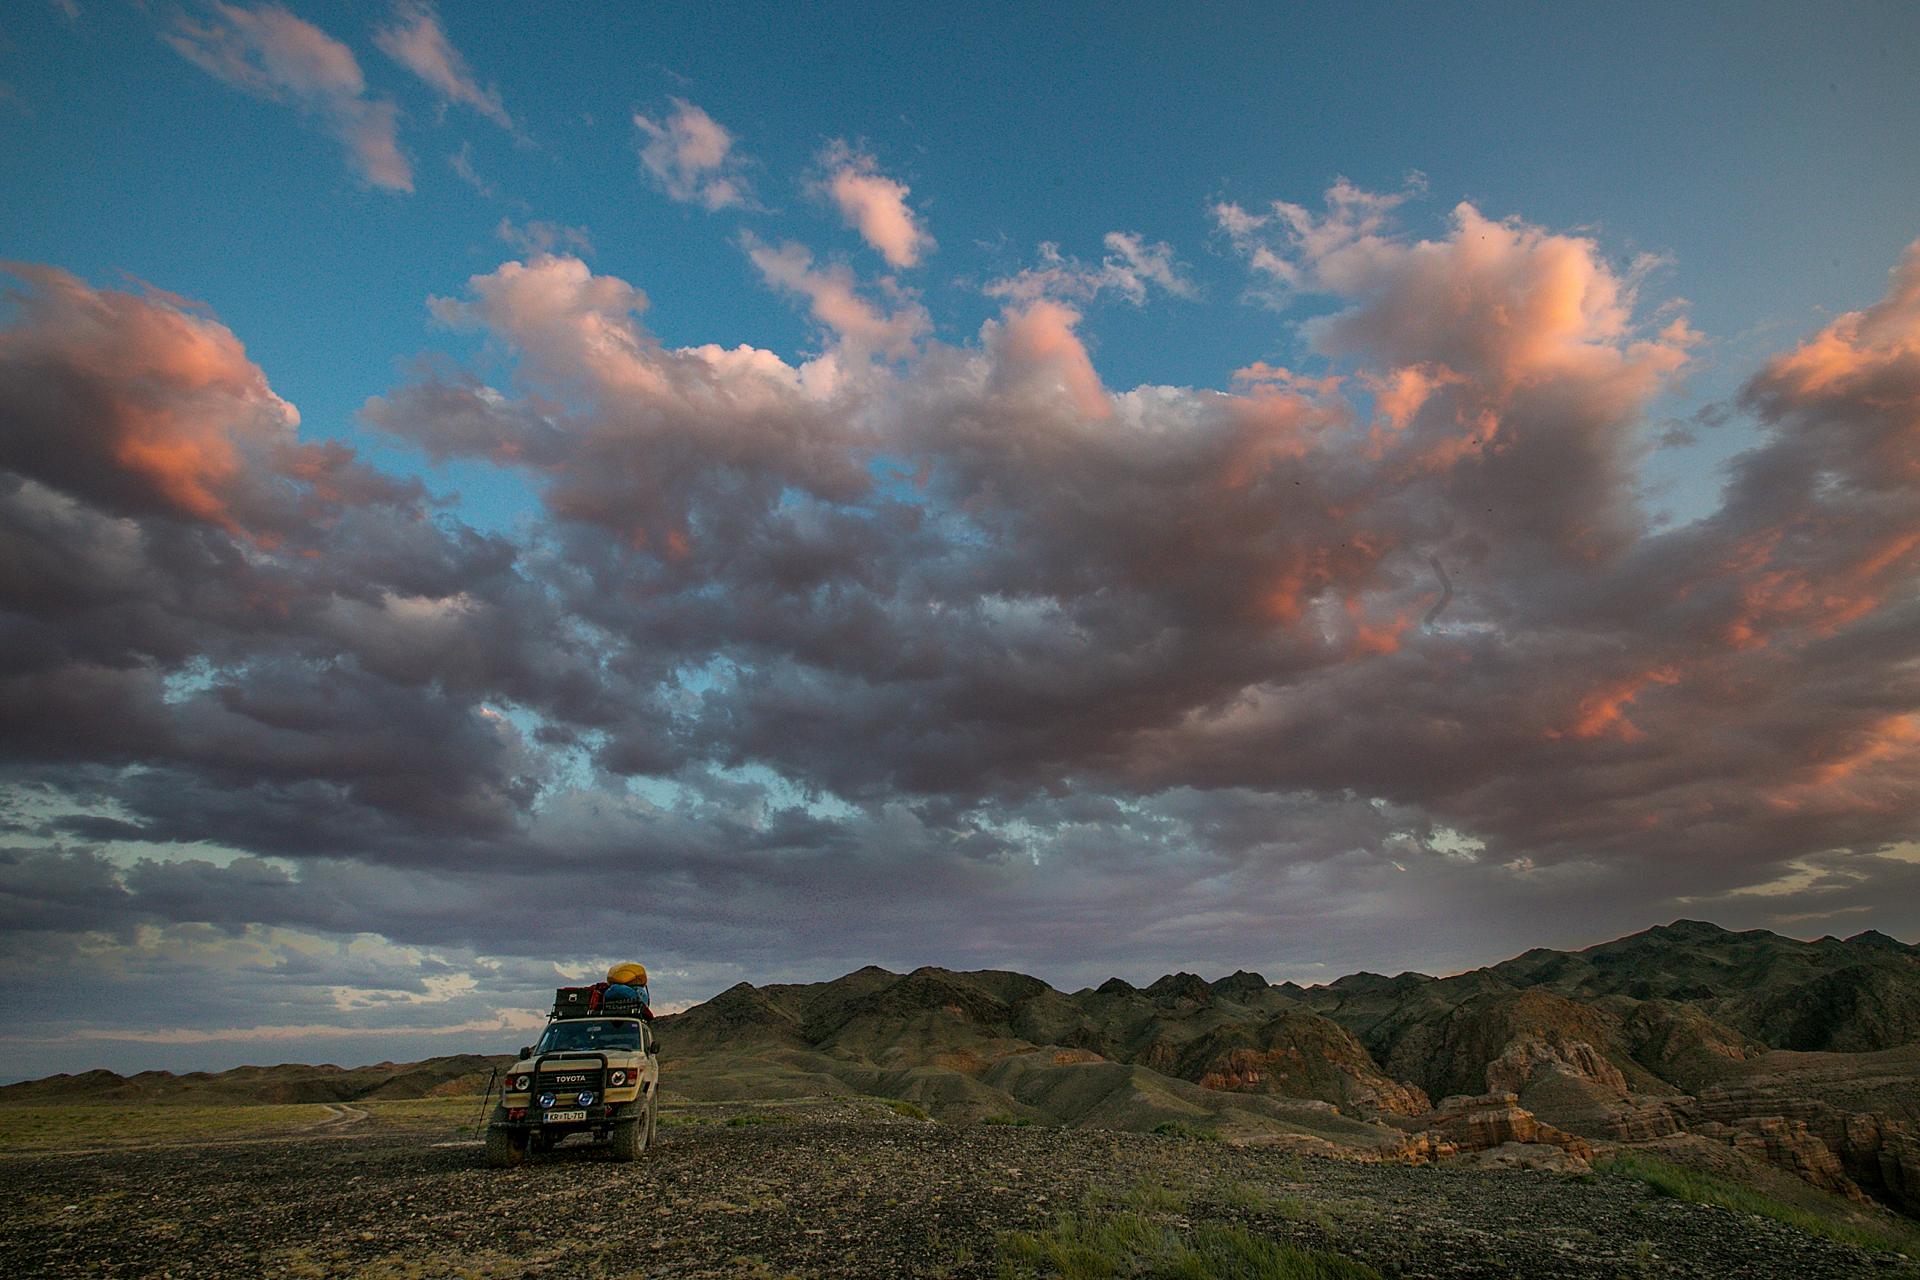 Kazakhstan overland katja jemec